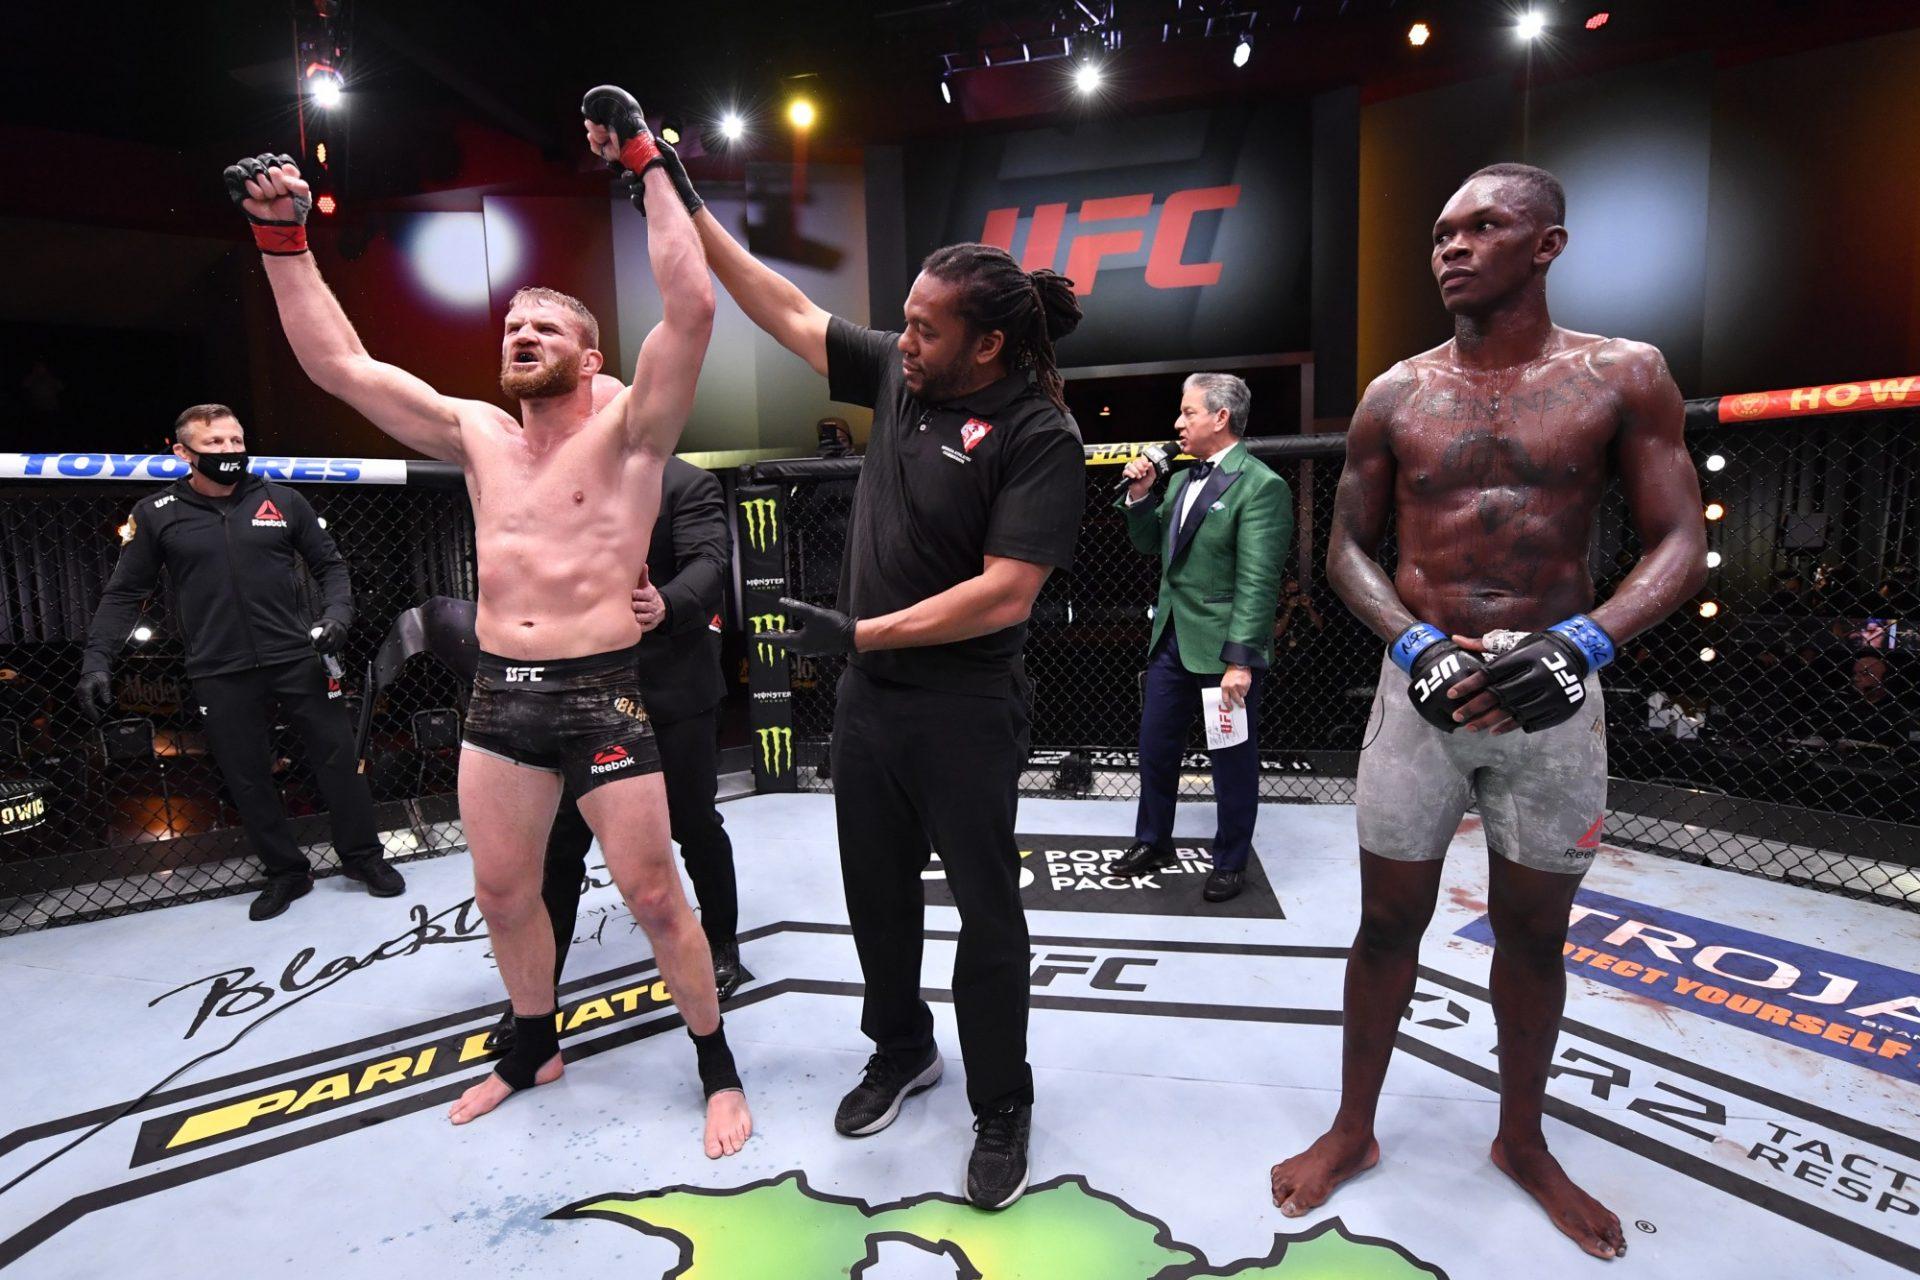 Israel Adesanya will eventually fight Jan Blachowicz in a rematch, says Coach - Israel Adesanya